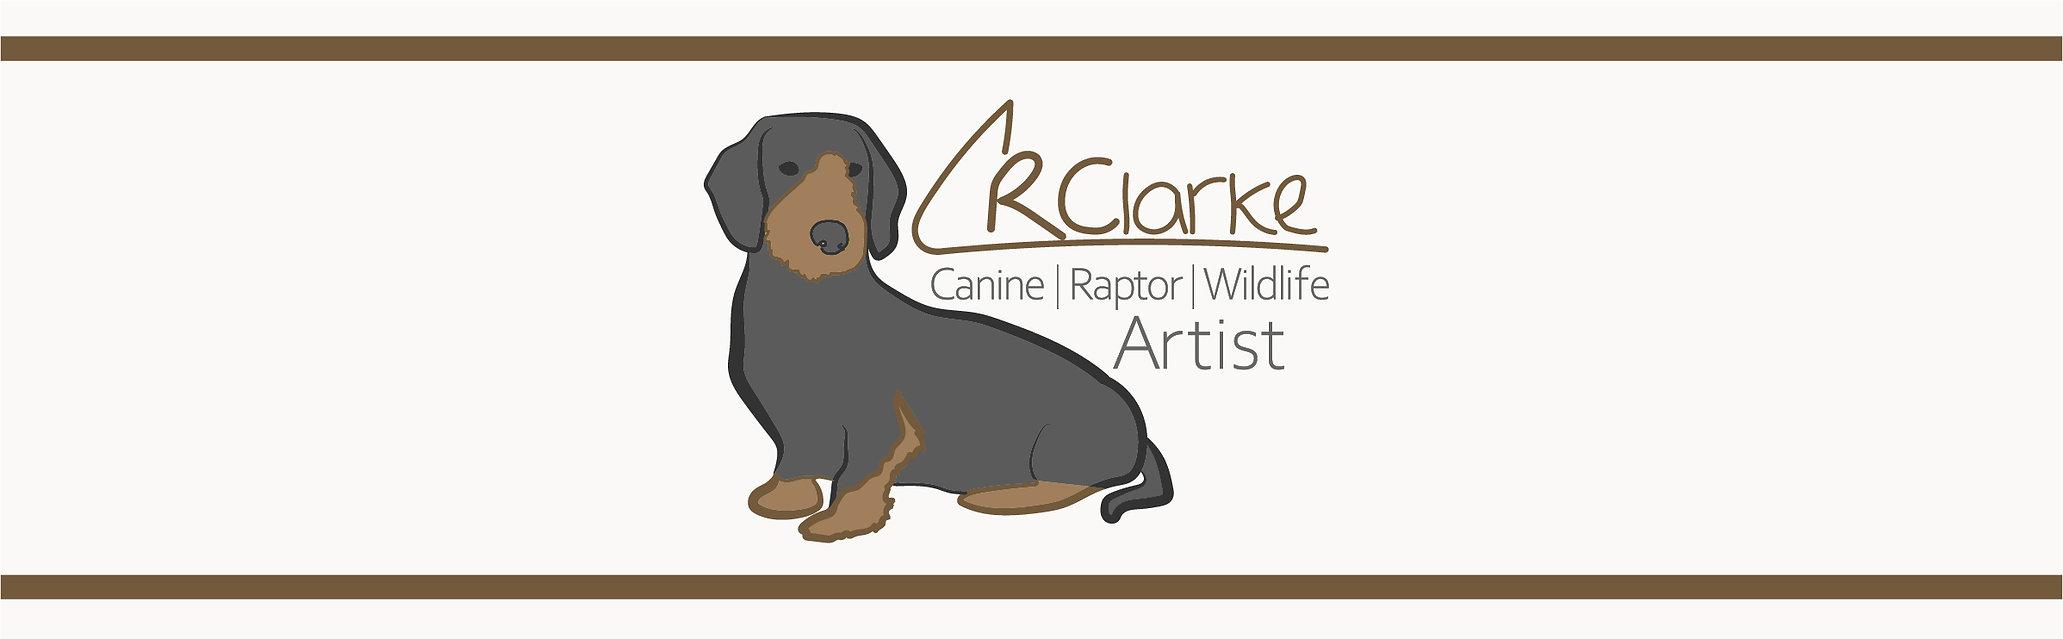 crc website banner-01.jpg